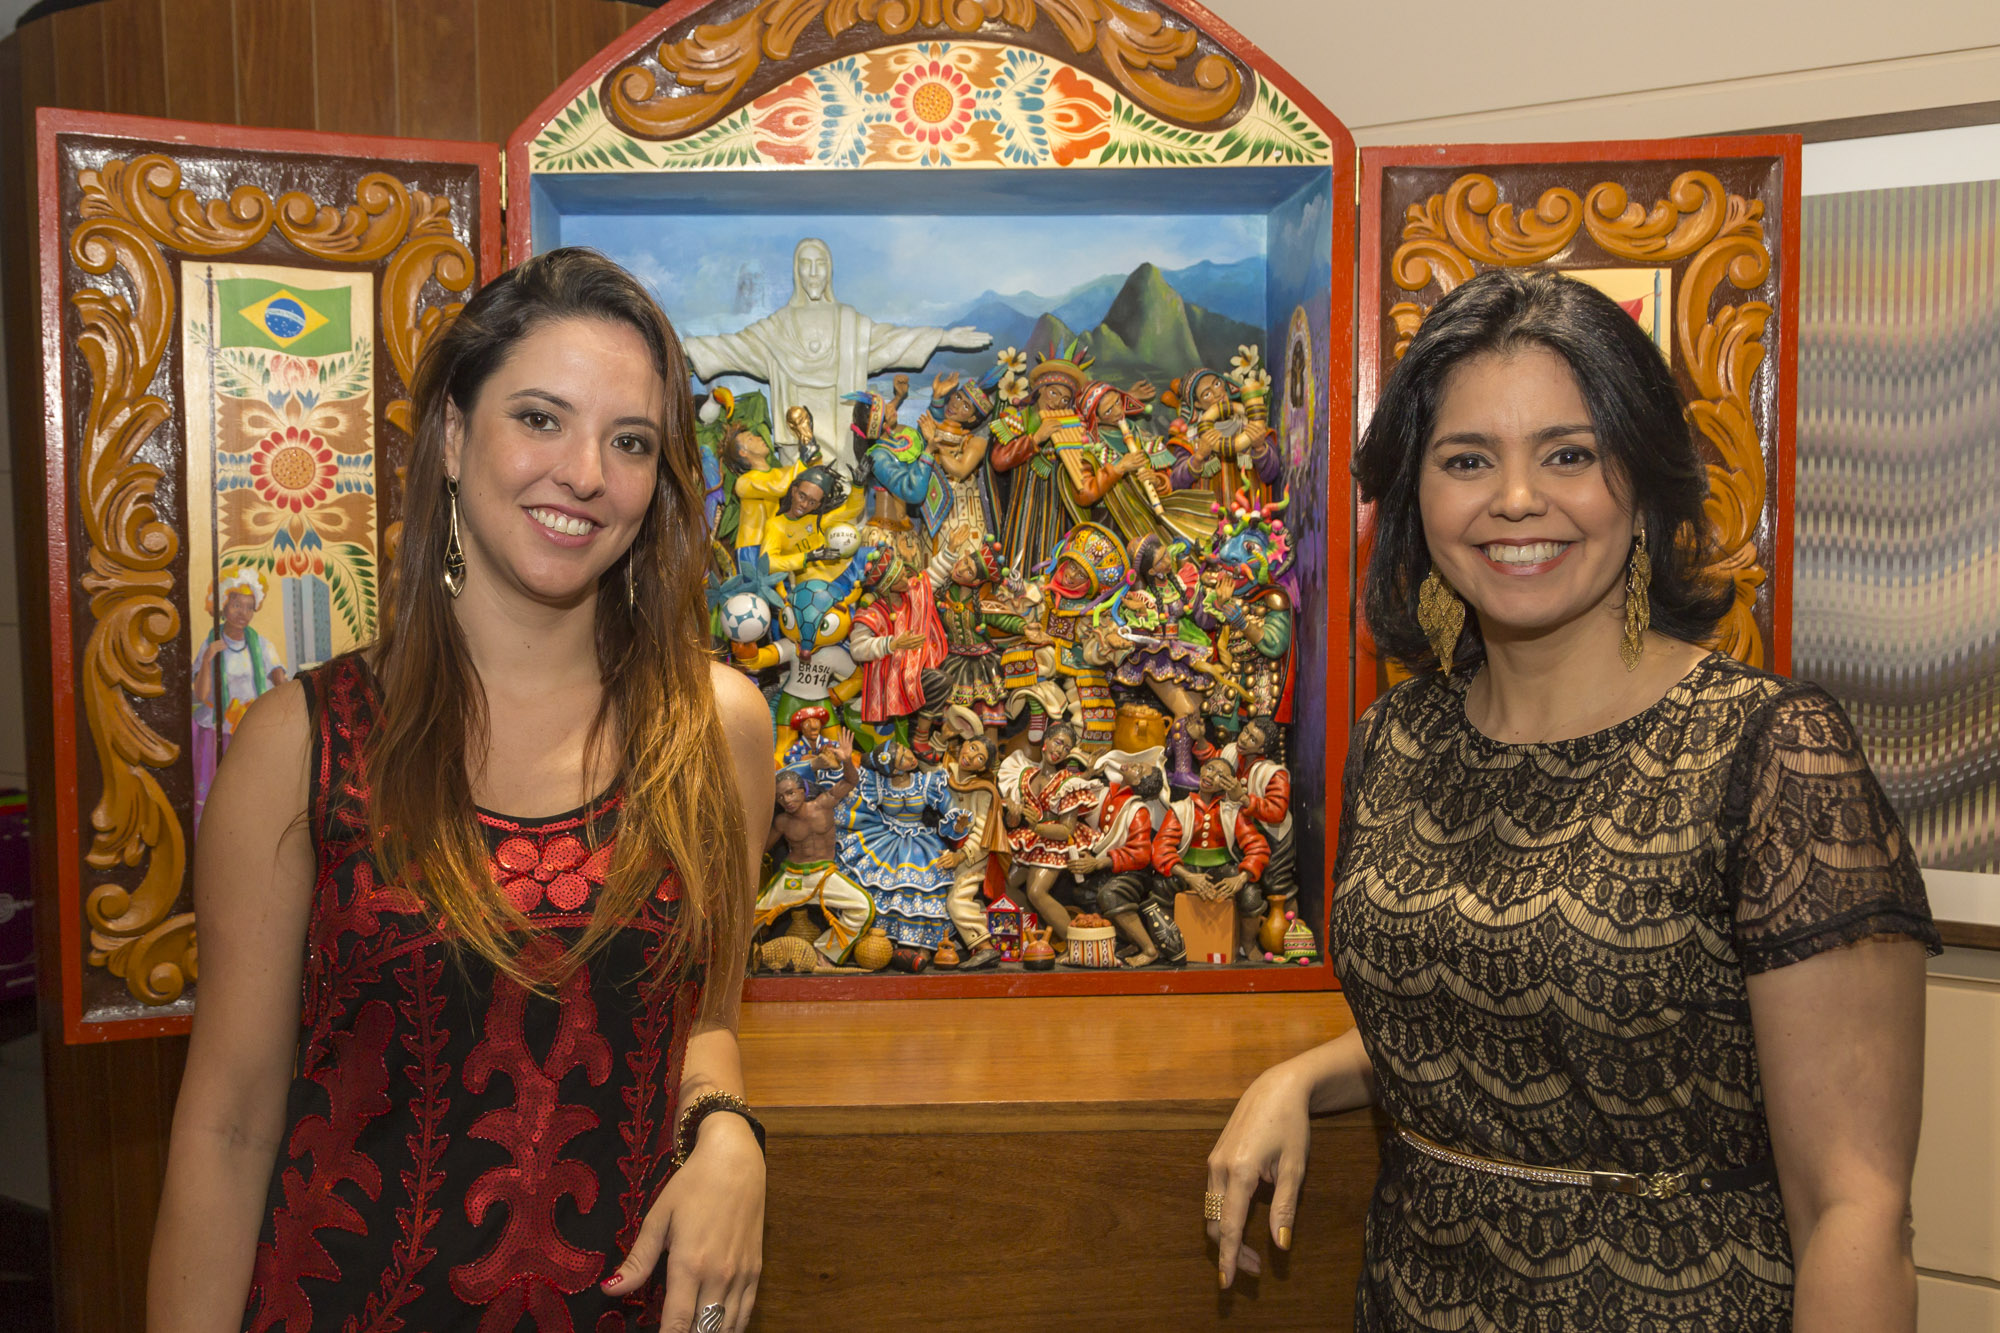 Camila Cardoso e Bertta